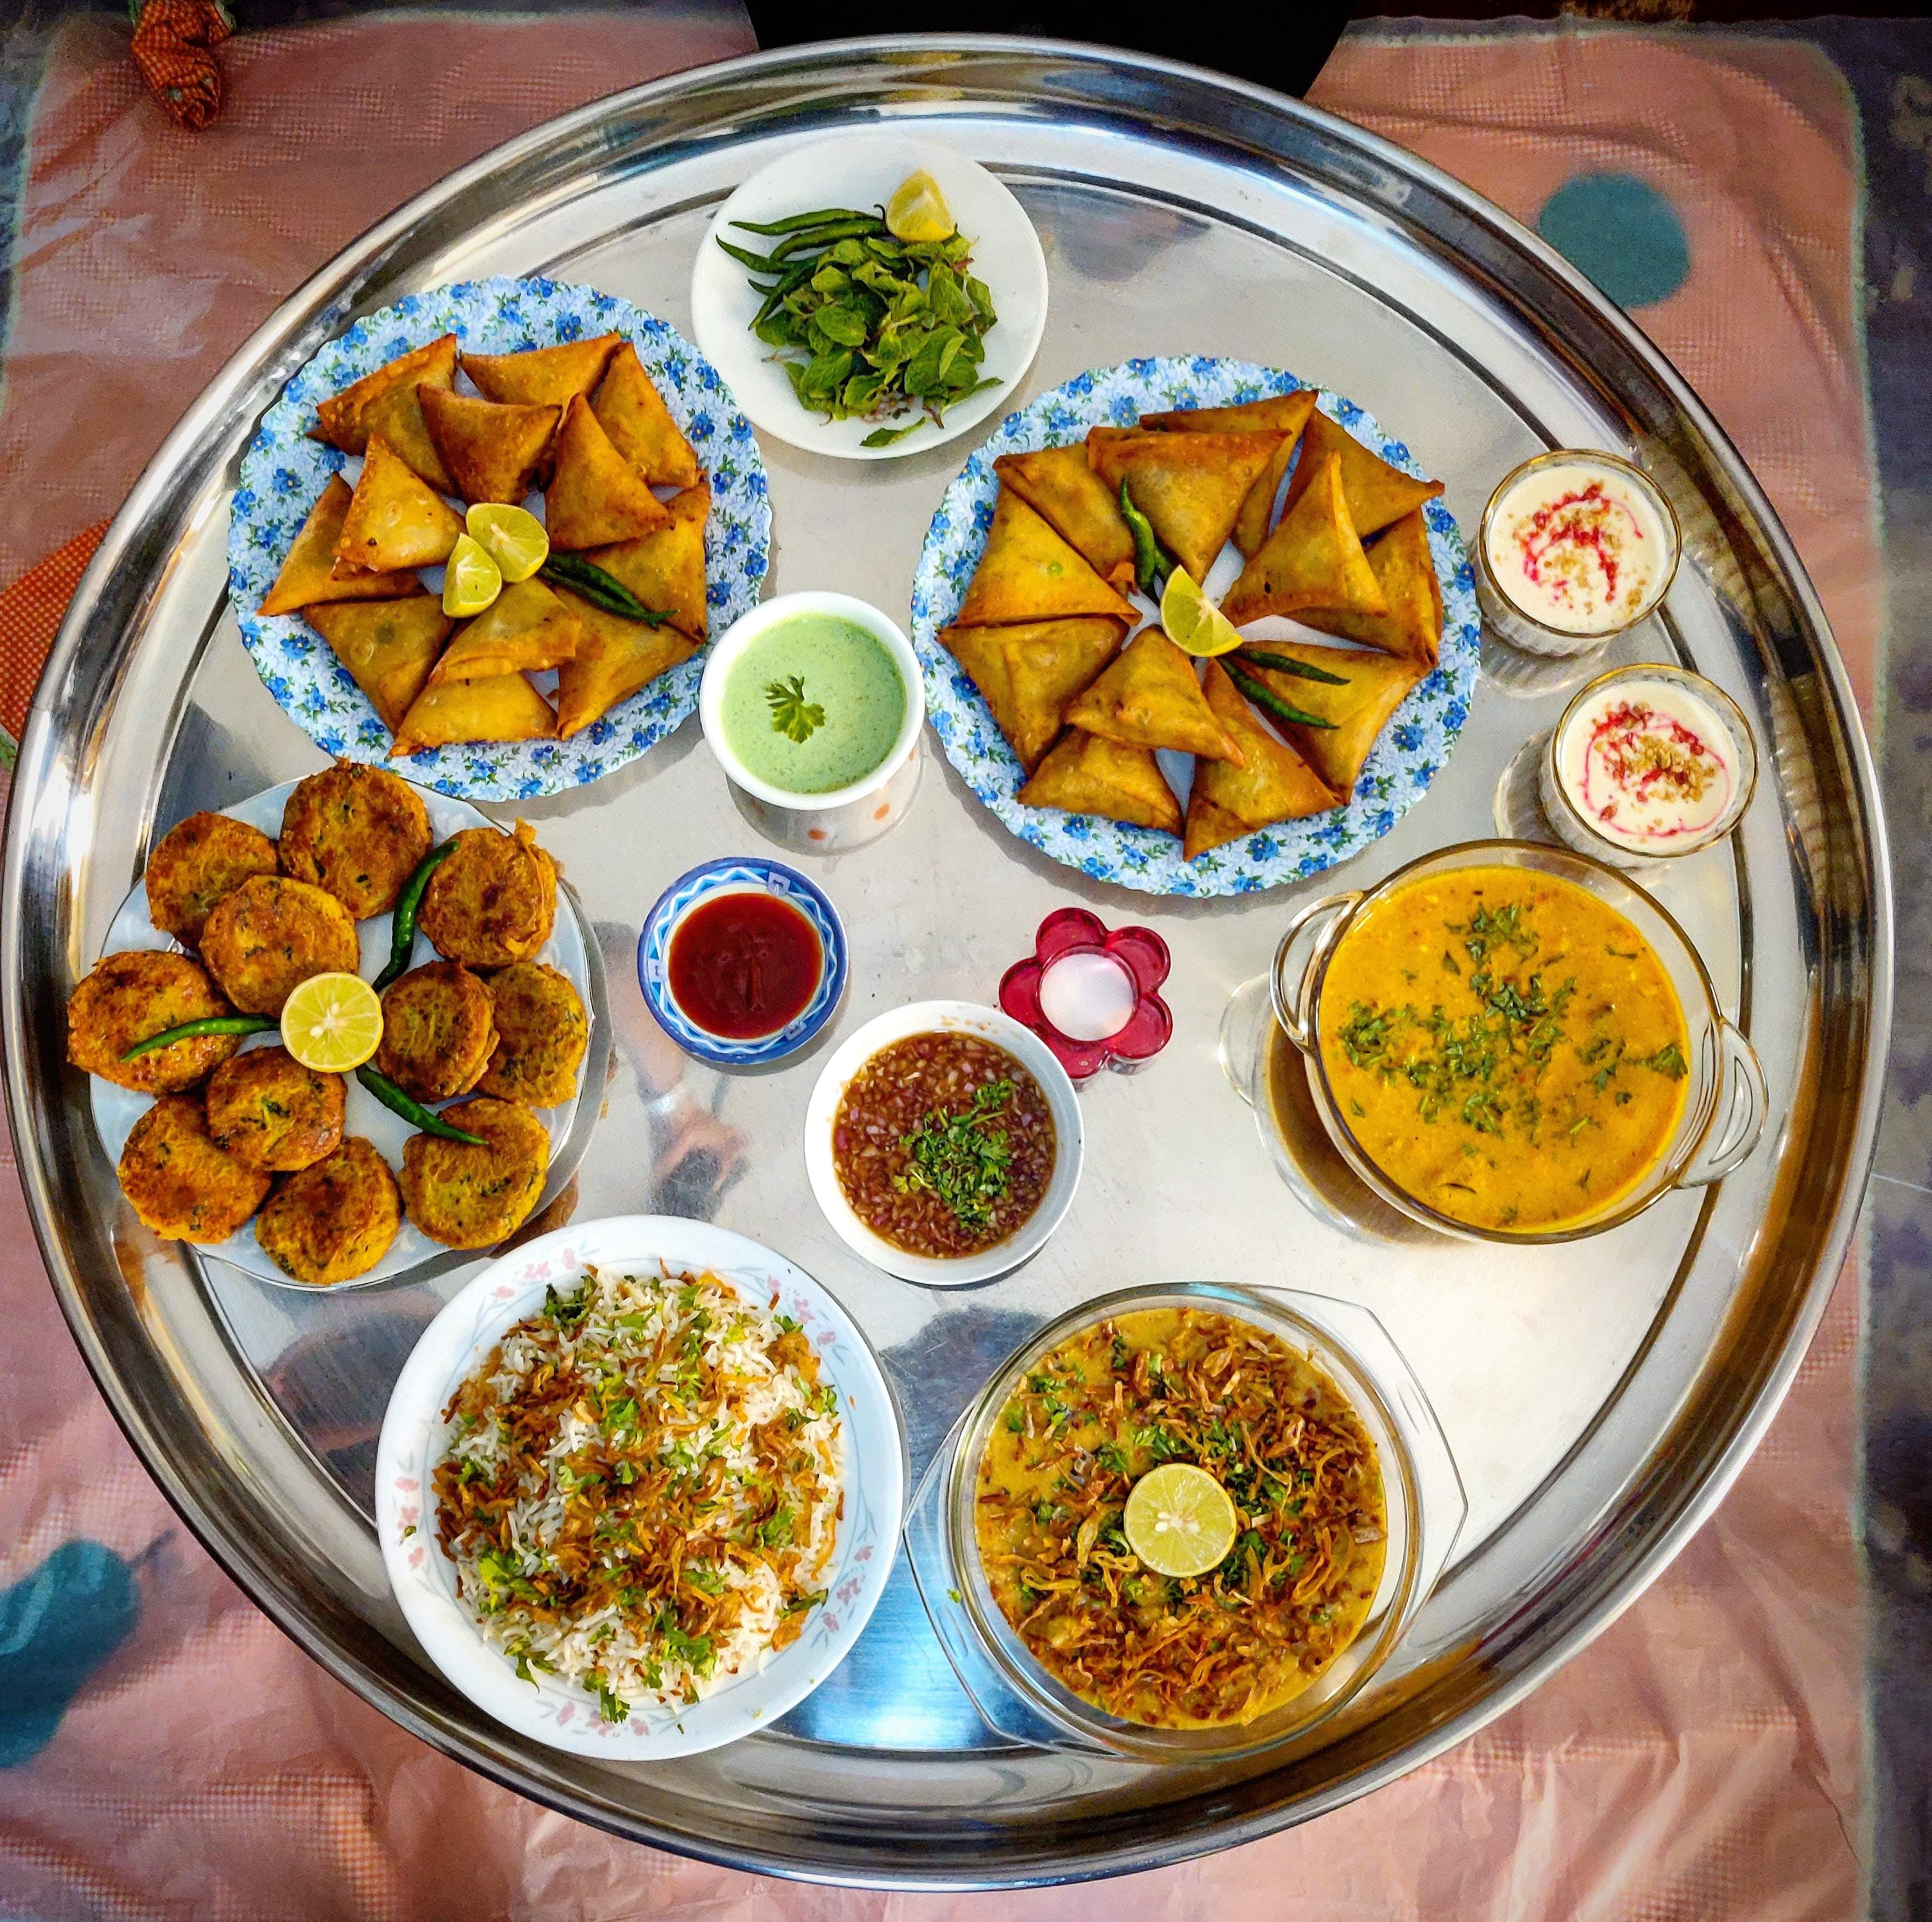 Dish,Food,Cuisine,Meal,Ingredient,Vegetarian food,Brunch,Produce,Lunch,Meze